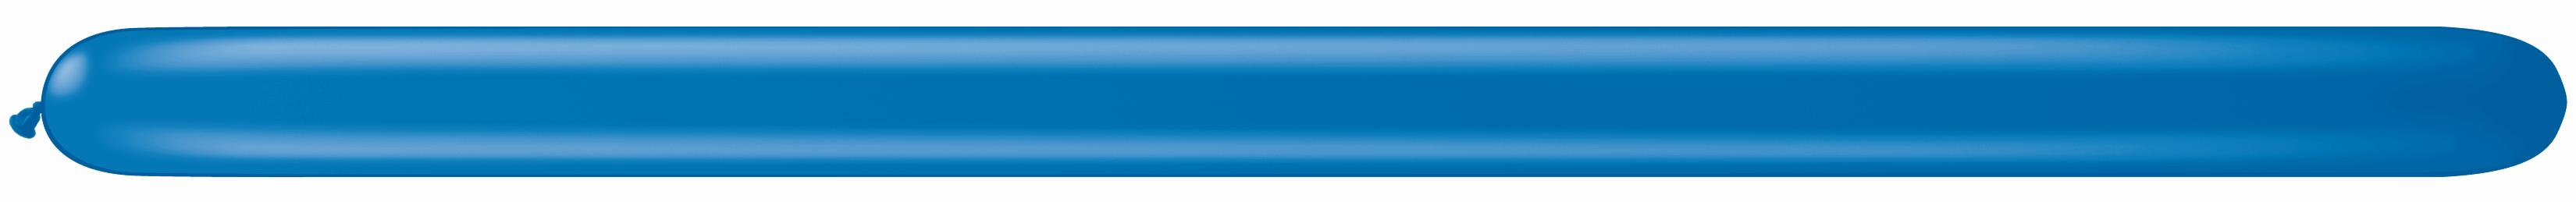 350Q Latex Balloons (100 Count) Dark Blue